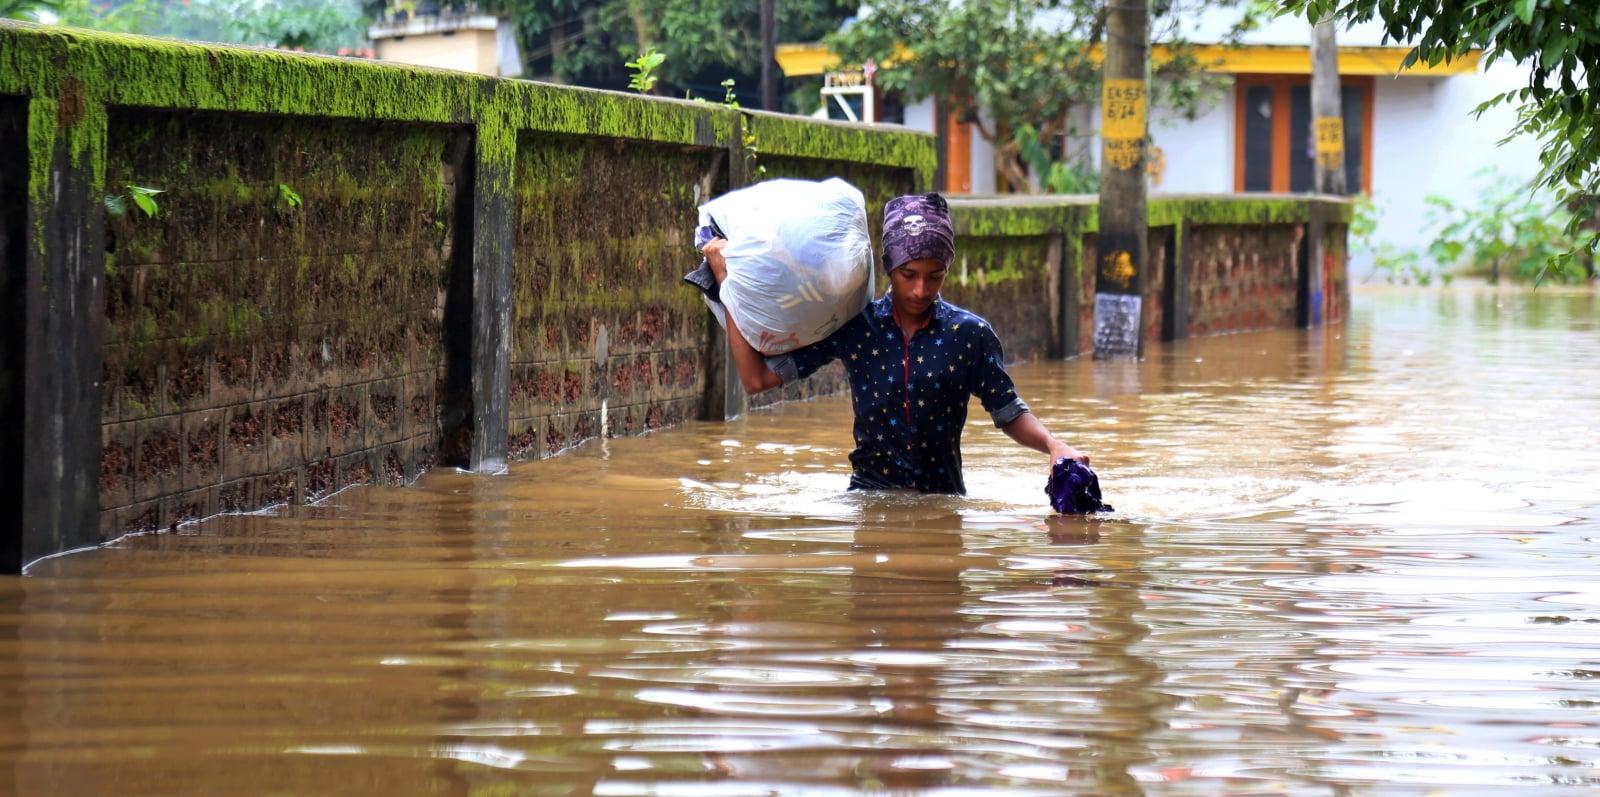 Powódź w Indiach EPA/PRAKASH ELAMAKKARA